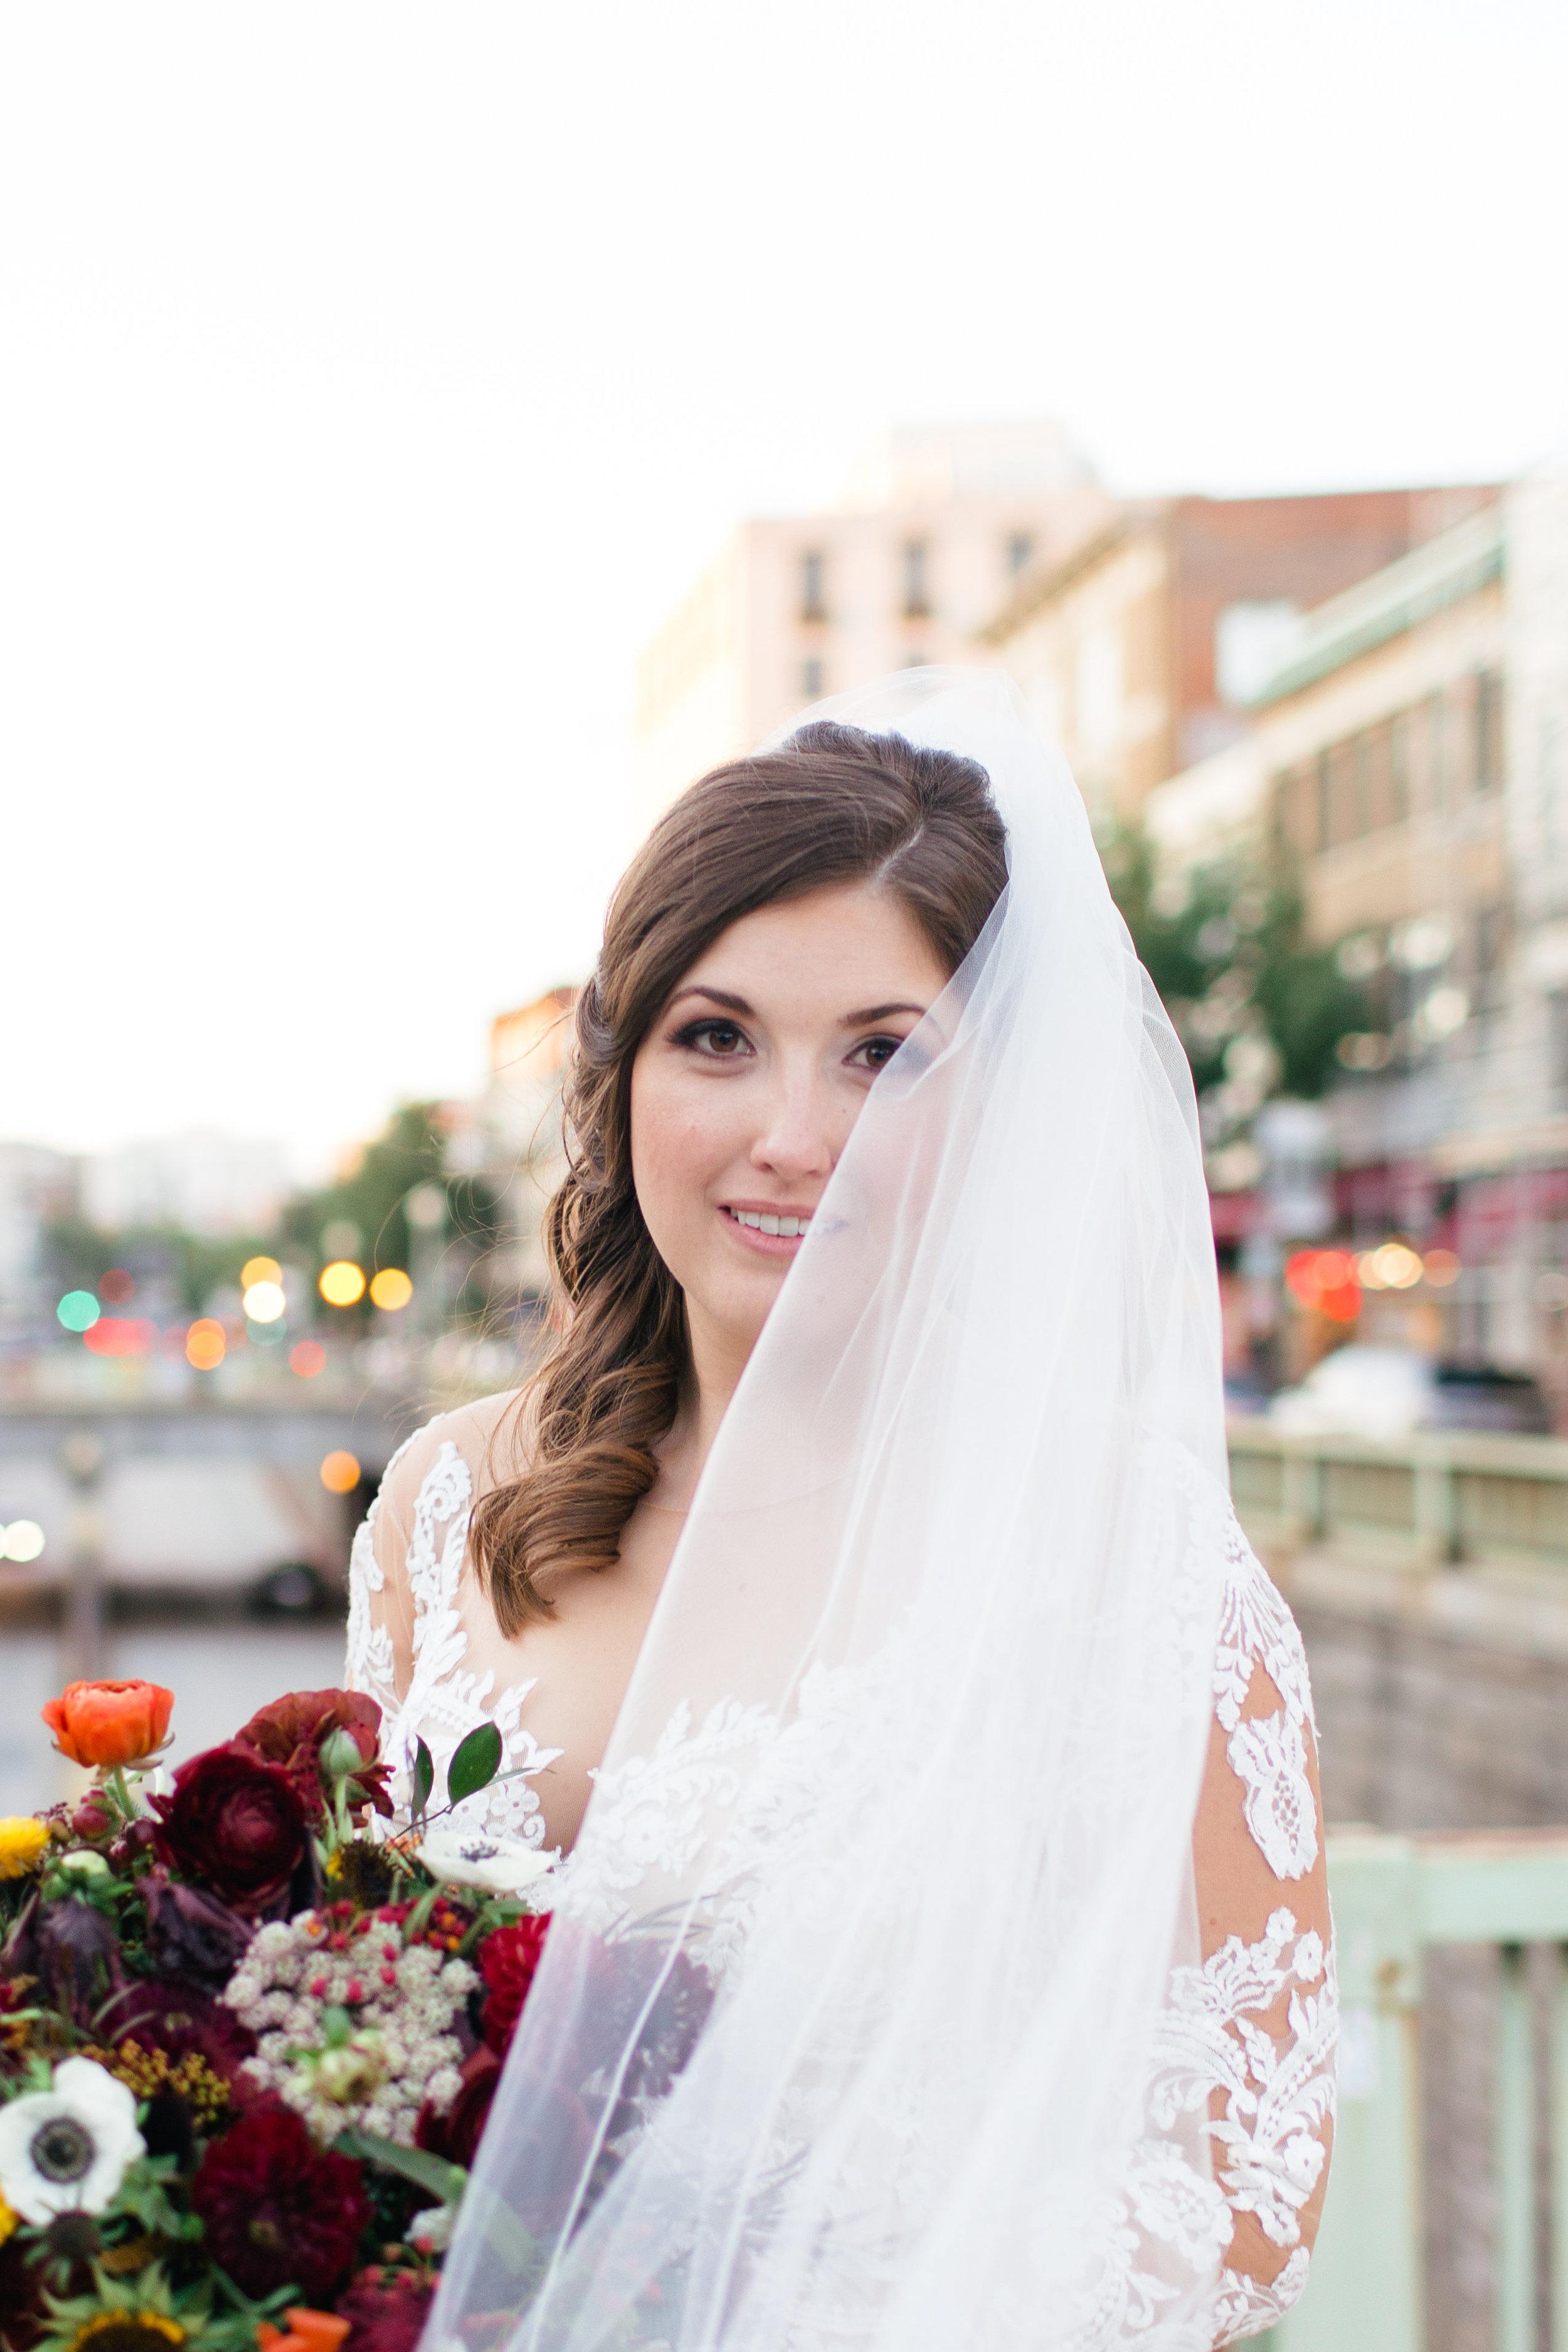 Dupon Circle Wedding | Washington DC Wedding Photography | Rebecca Wilcher Photography -26.jpg